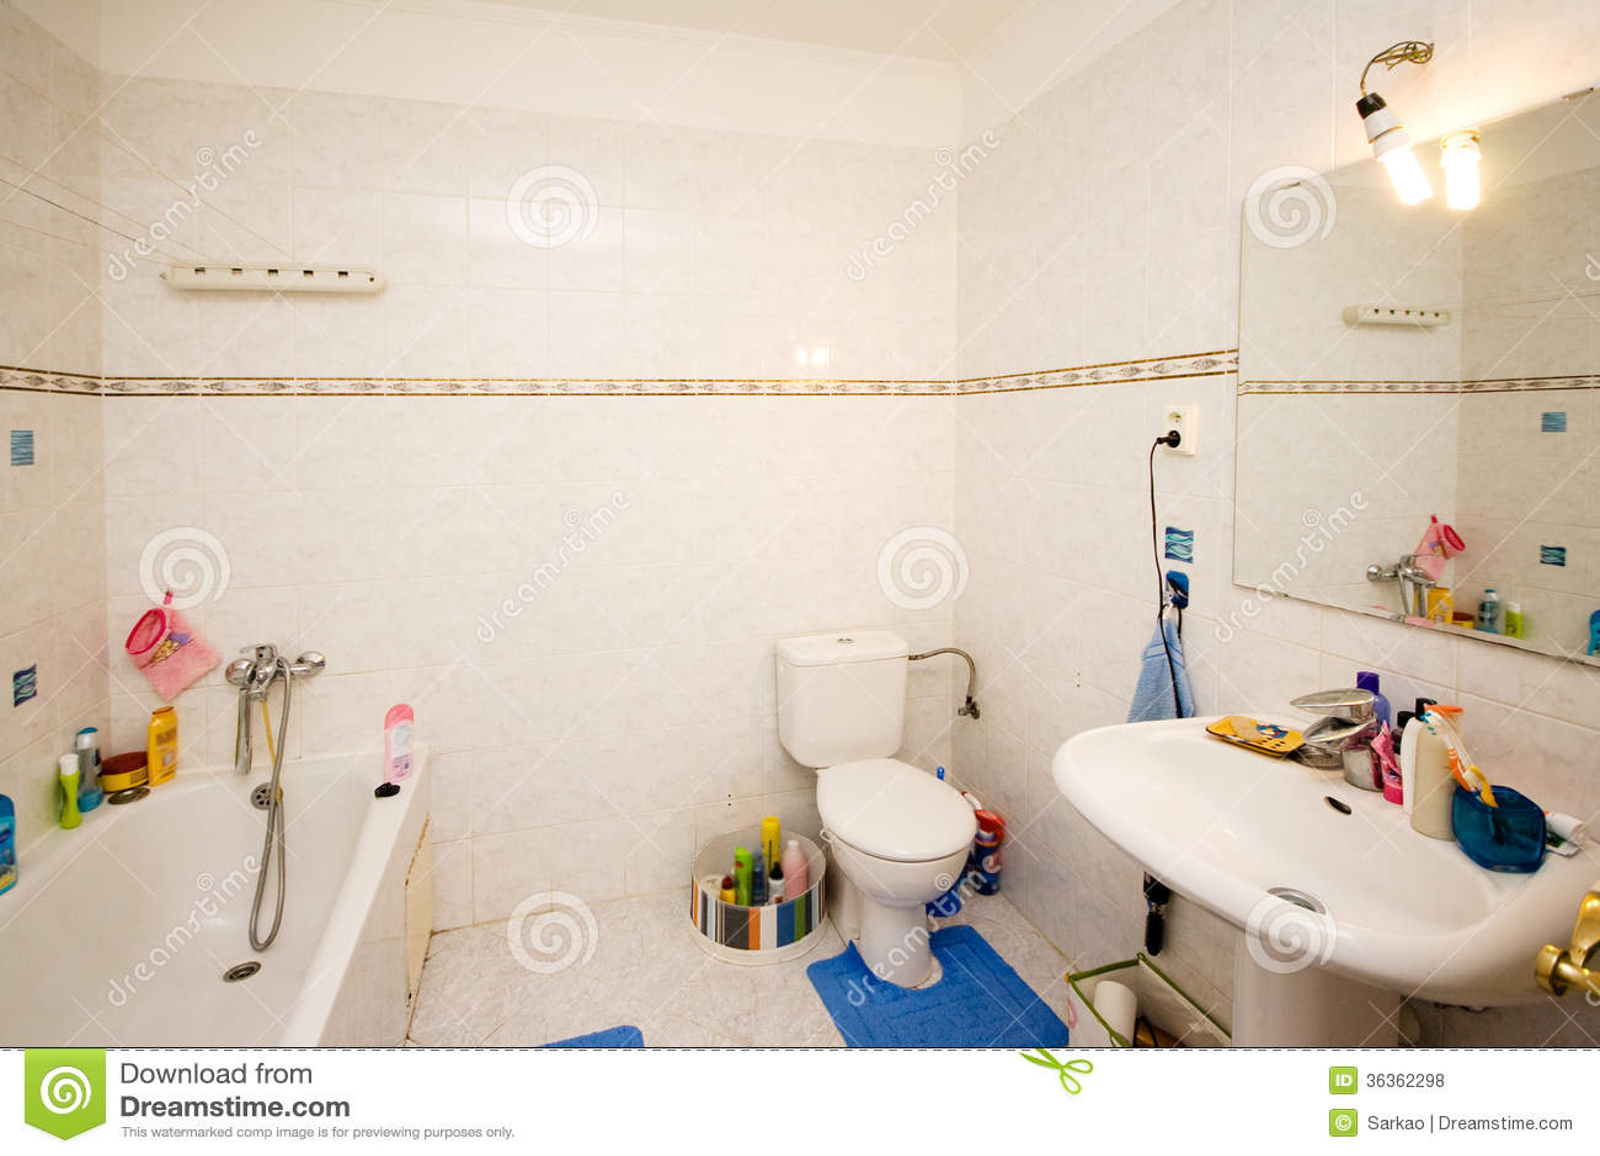 Messy Bathroom Royalty Free Stock Photos Image 36362298